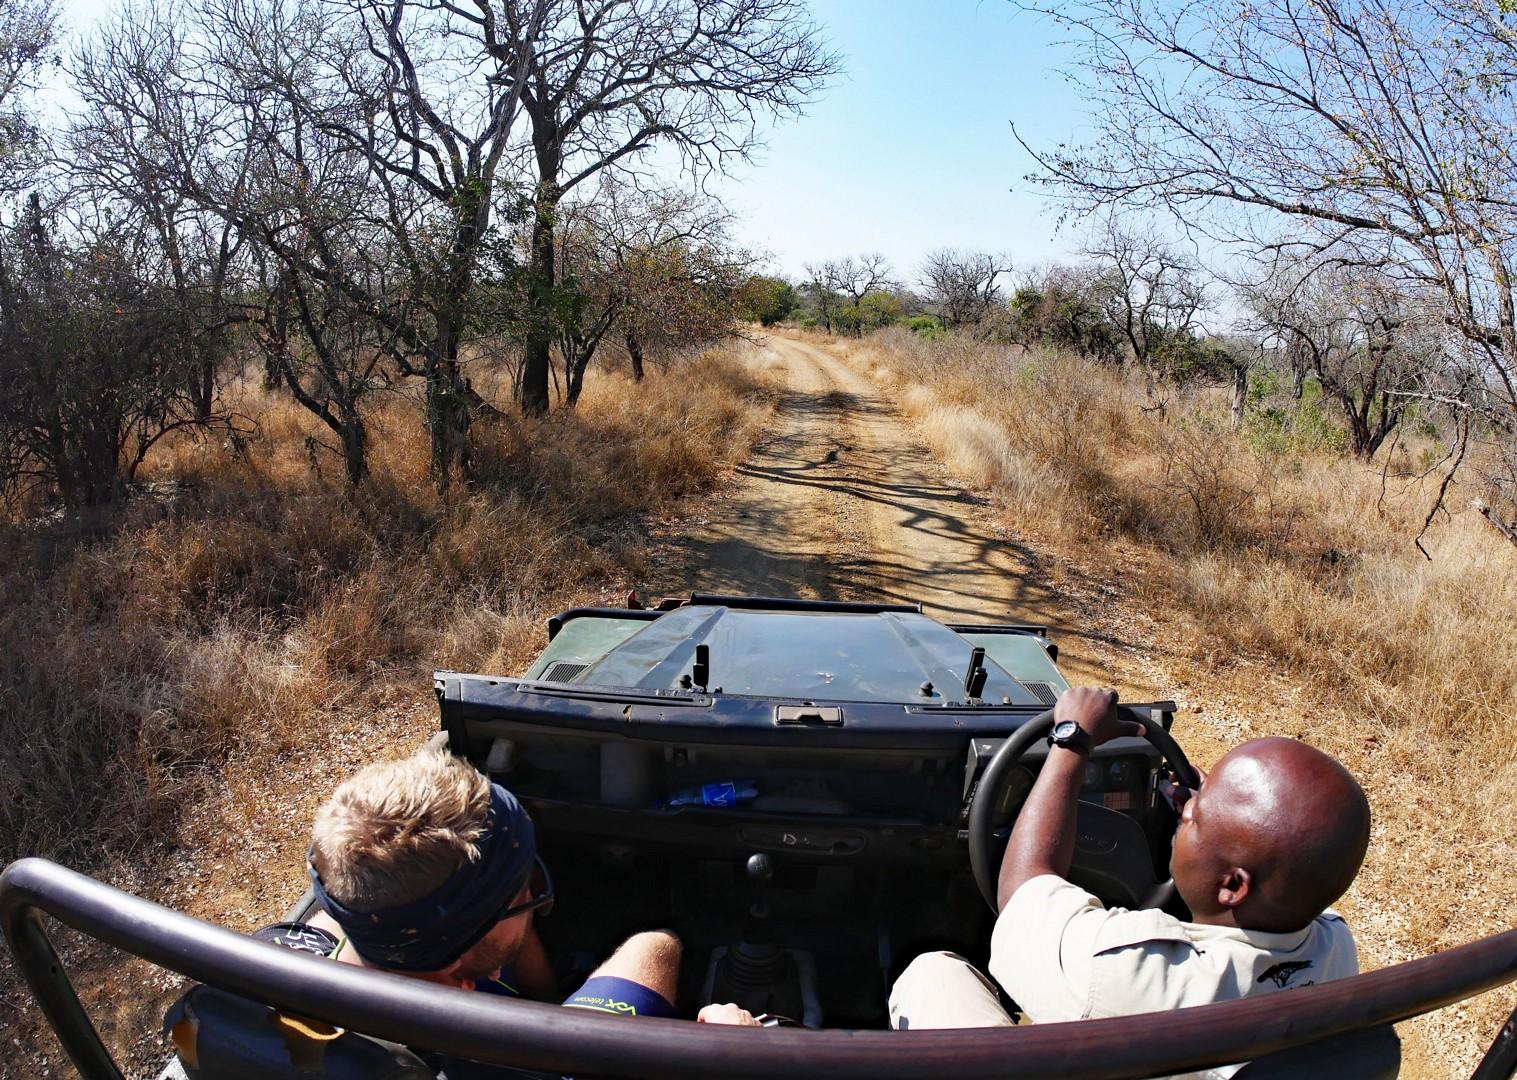 africa-swaziland-cycling safari-cycling-adventure.jpg - Eswatini (Swaziland) - Cycling Safari - Cycling Adventures